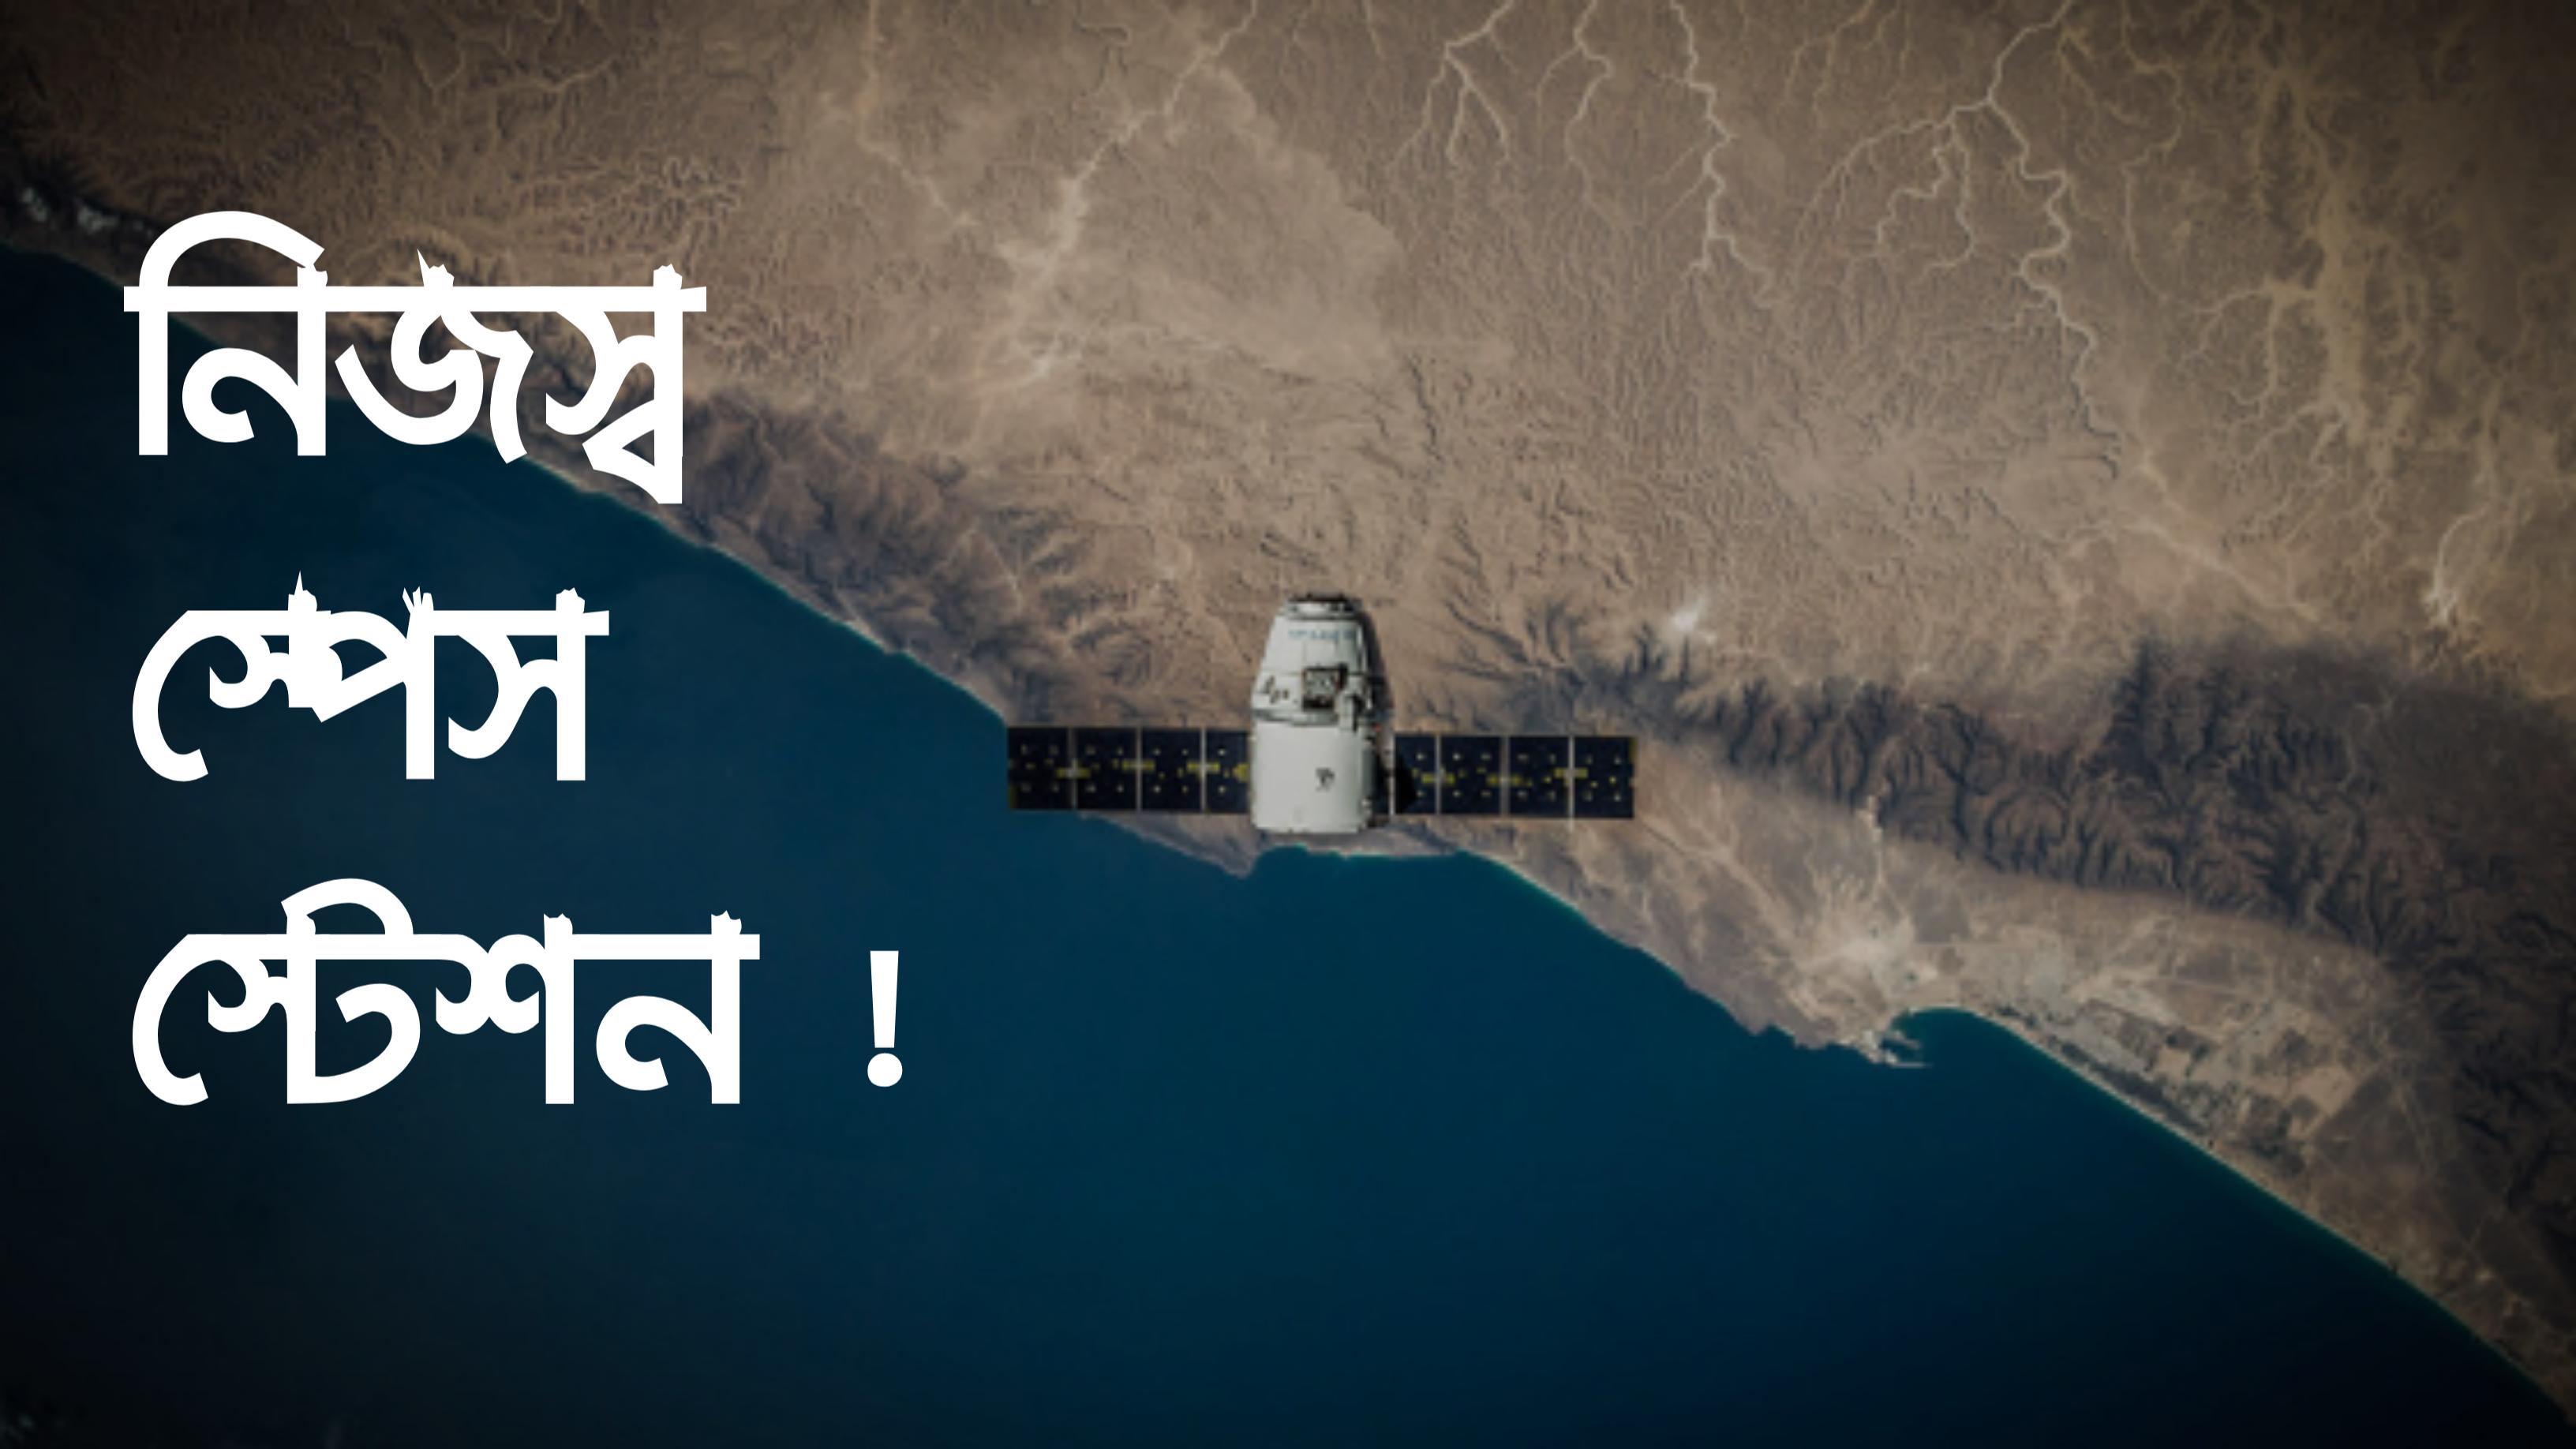 isro, india, space station, shresthoblog, bangla tech blog